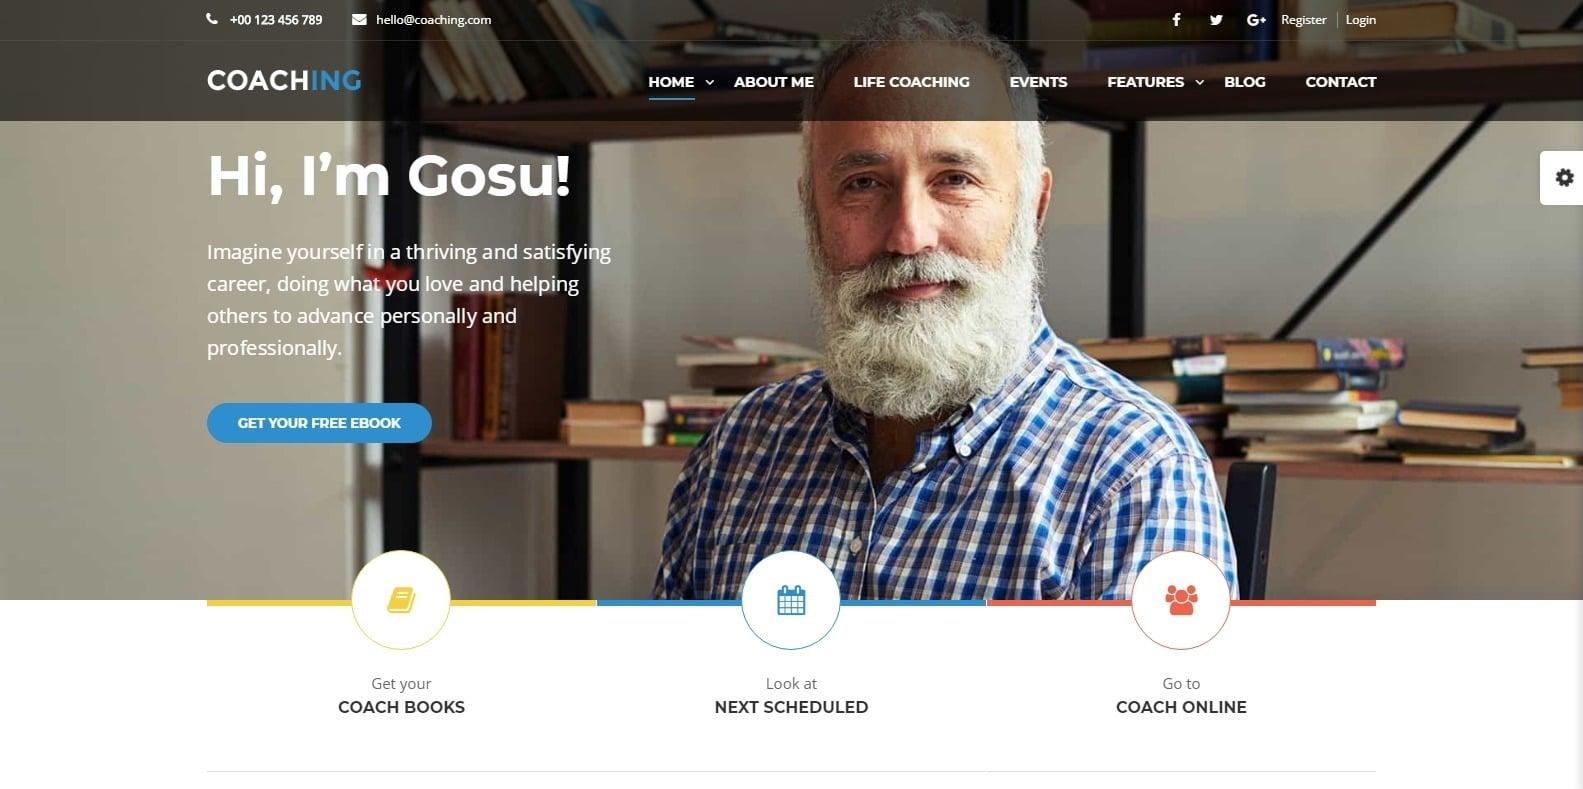 life-coaching-website template